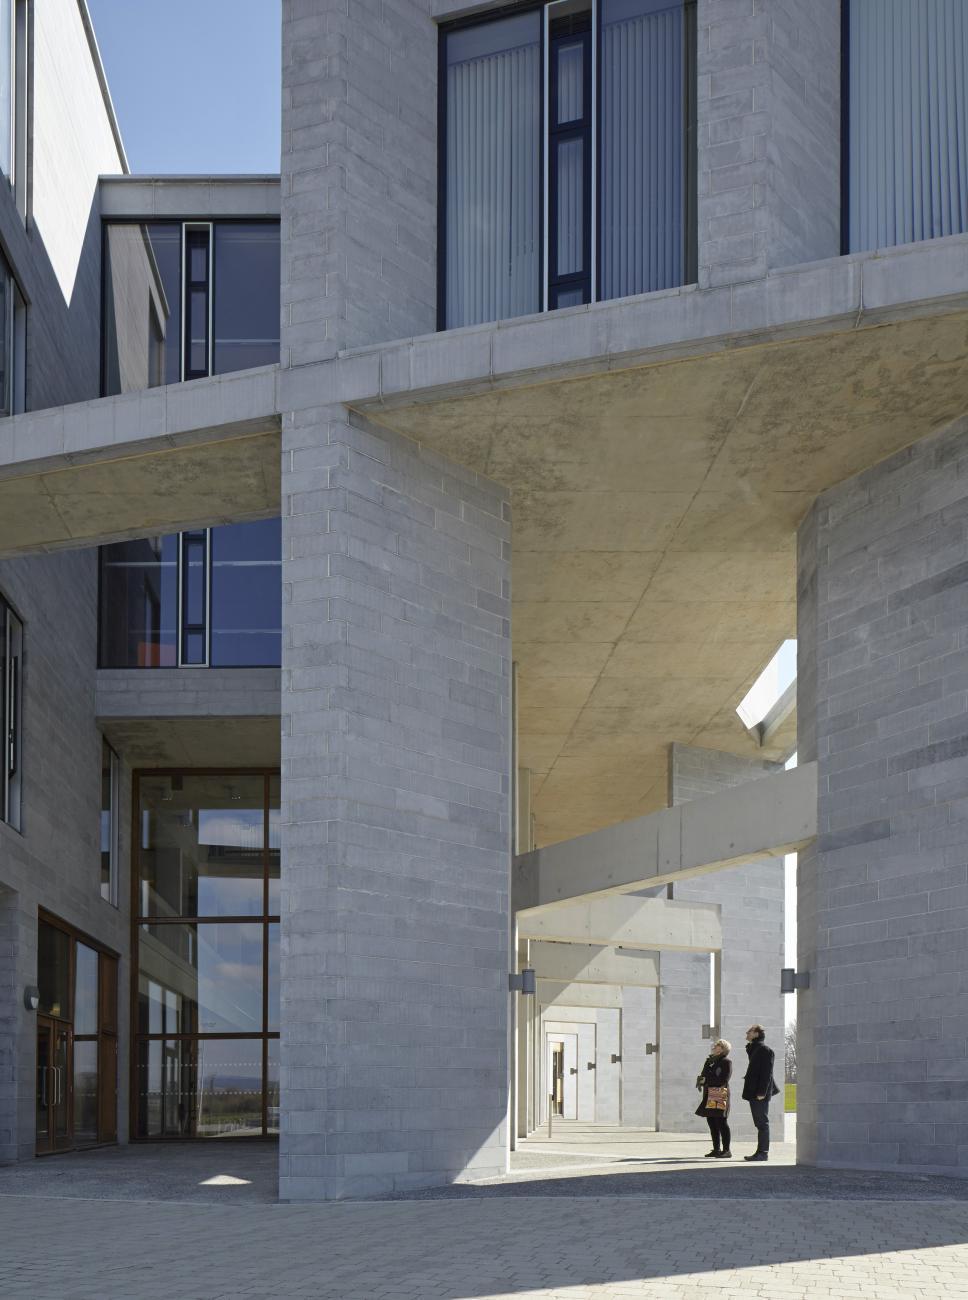 Medical School, University of Limerick by Grafton Architects in Ireland, 2012- Photo: courtesy of Dennis Gilbert.